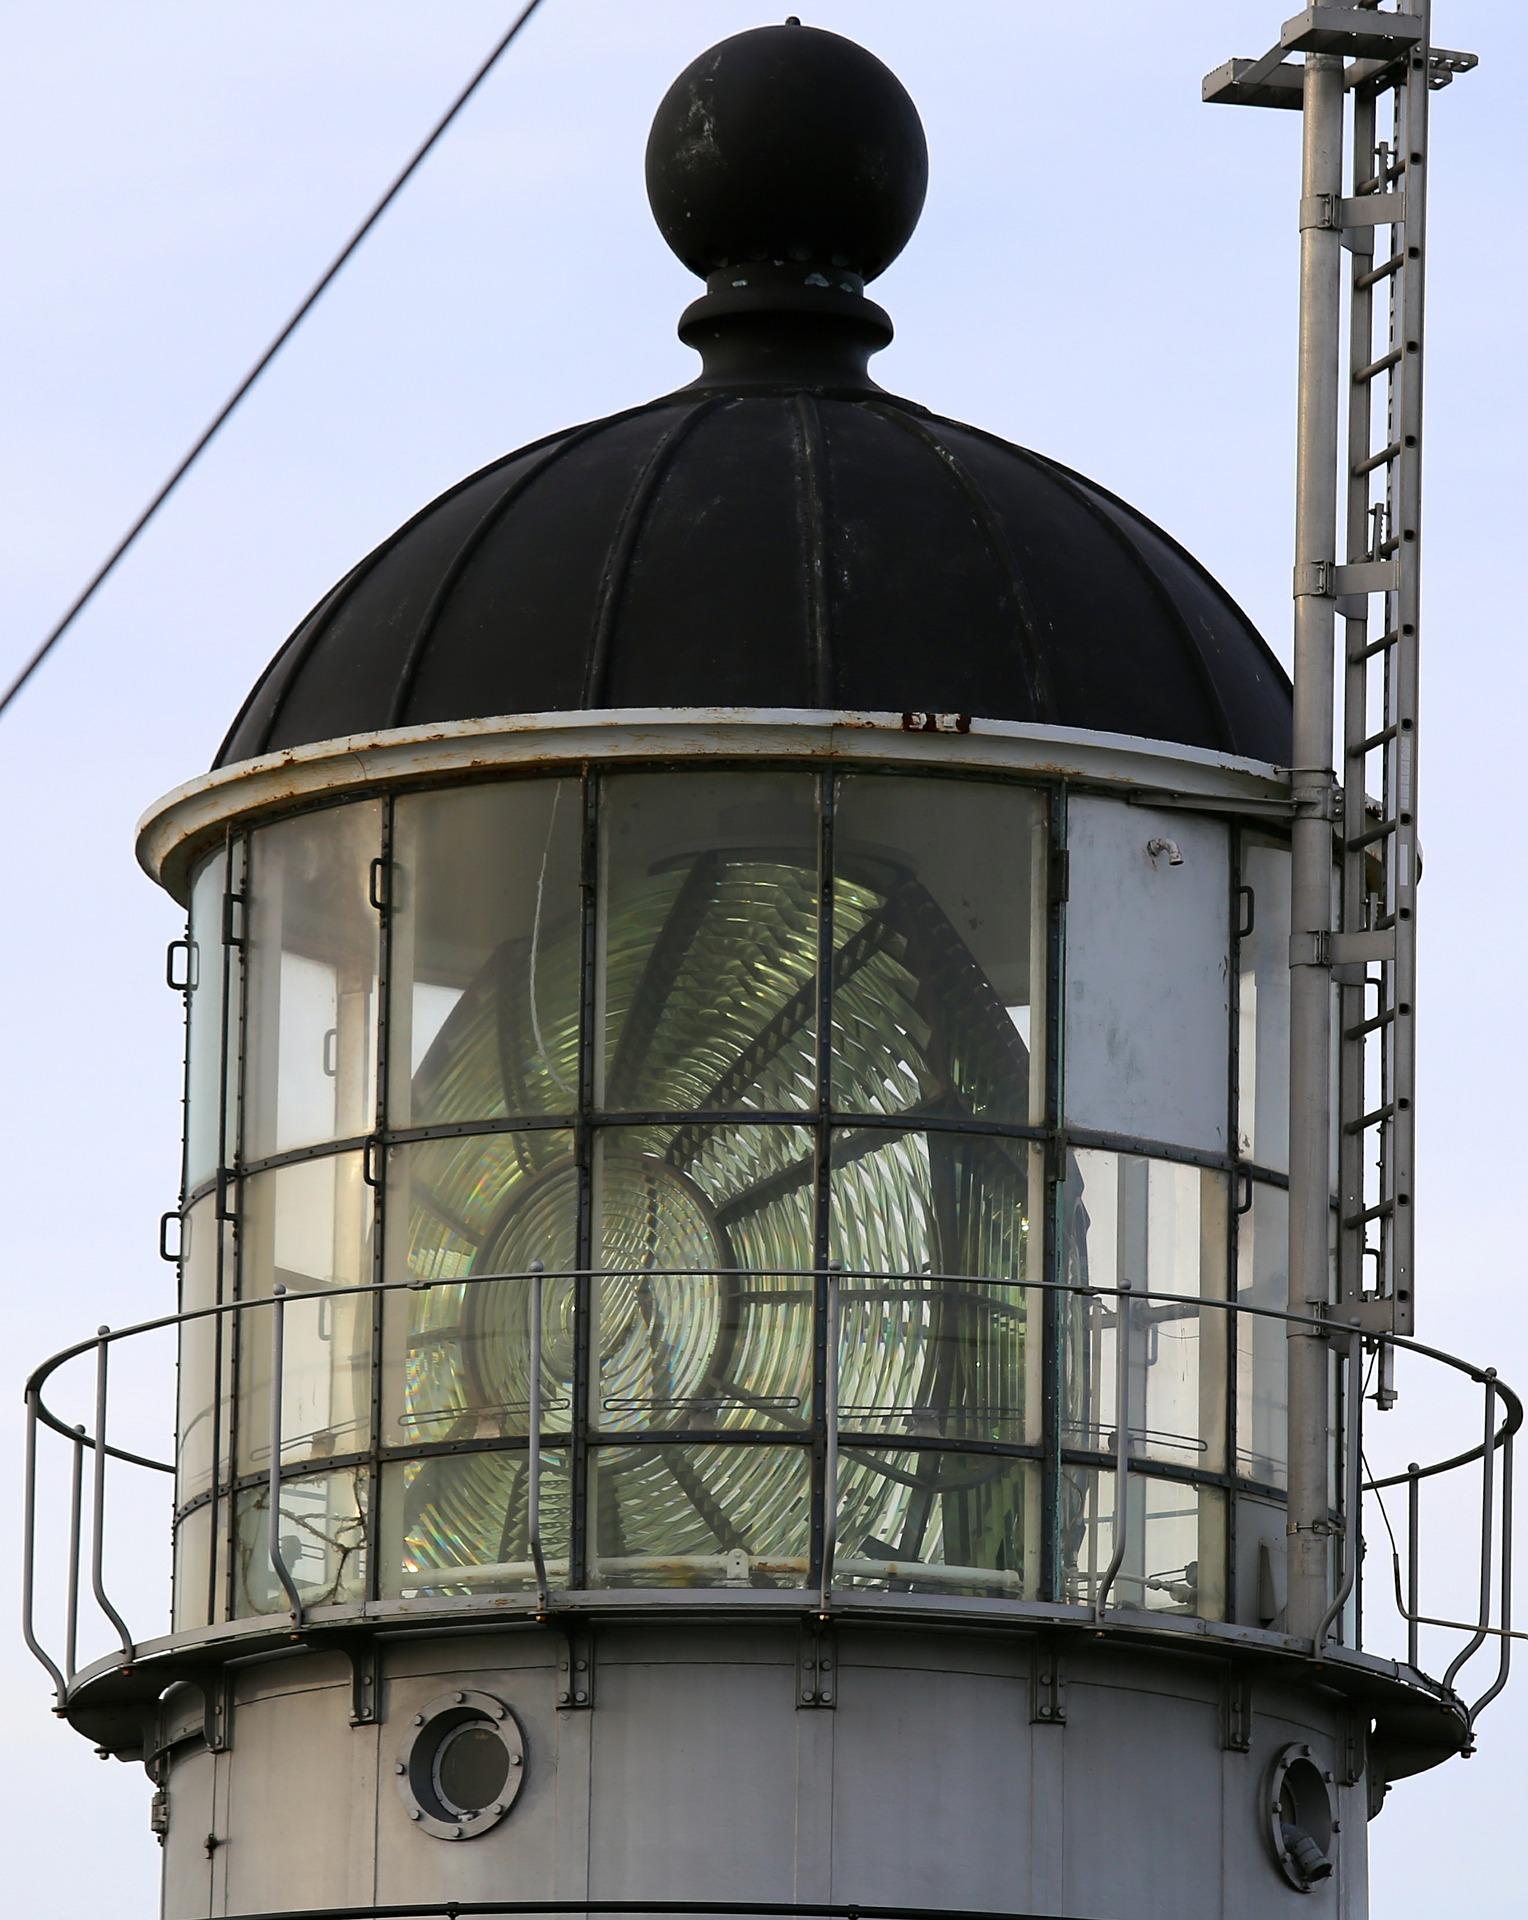 kullen-lighthouse-465538_1920